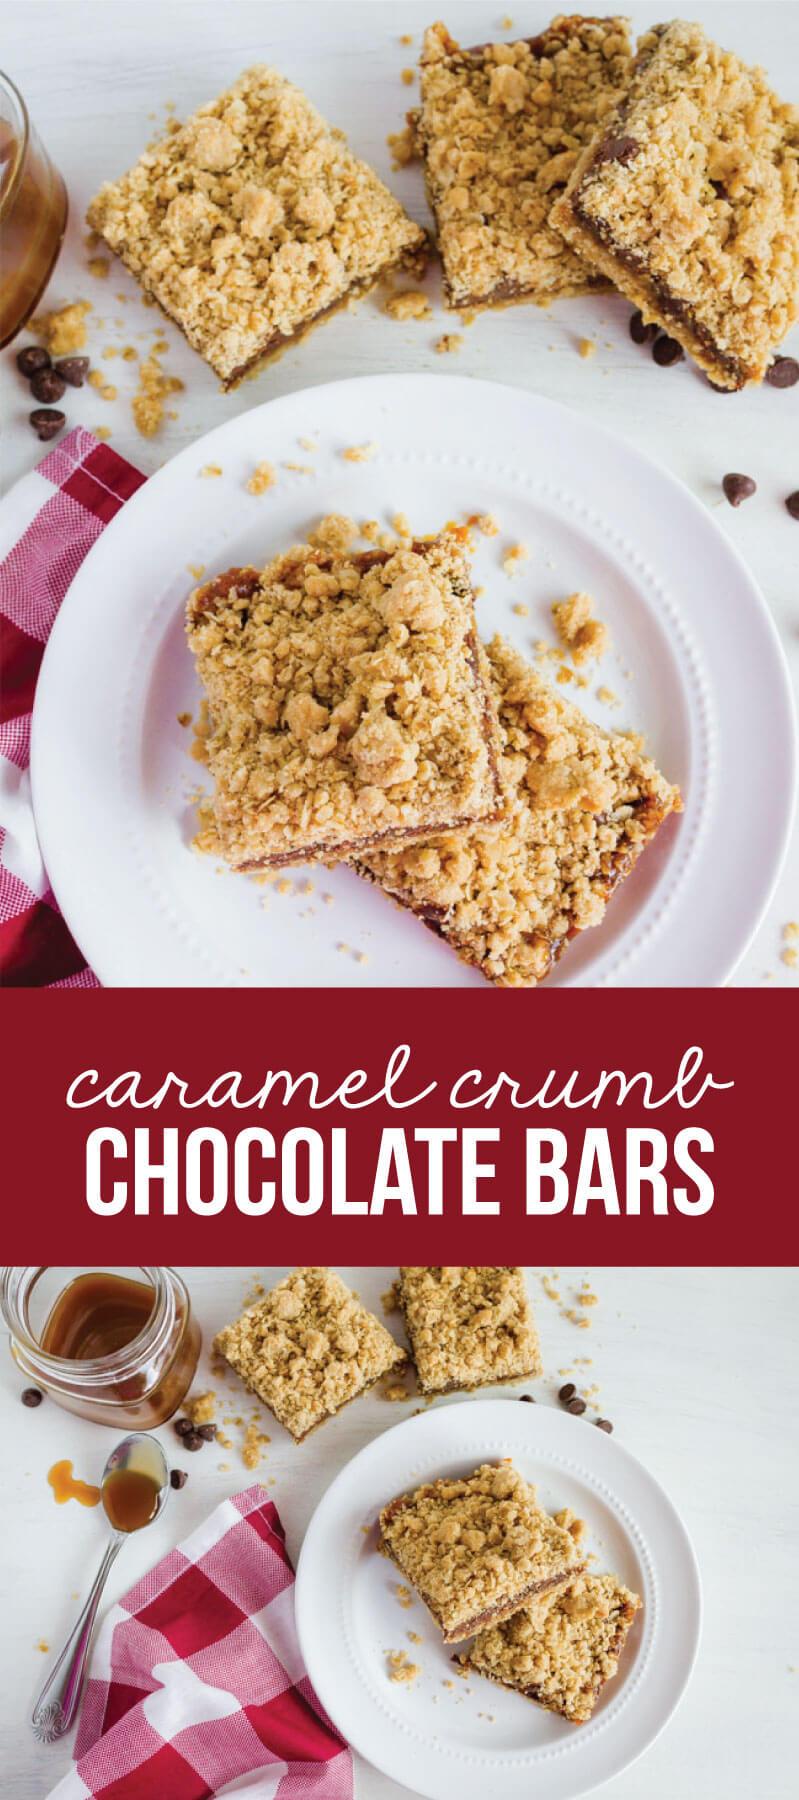 Caramel Crumb Chocolate Bars - make this easy dessert for a sweet treat! from www.thirtyhandmadedays.com